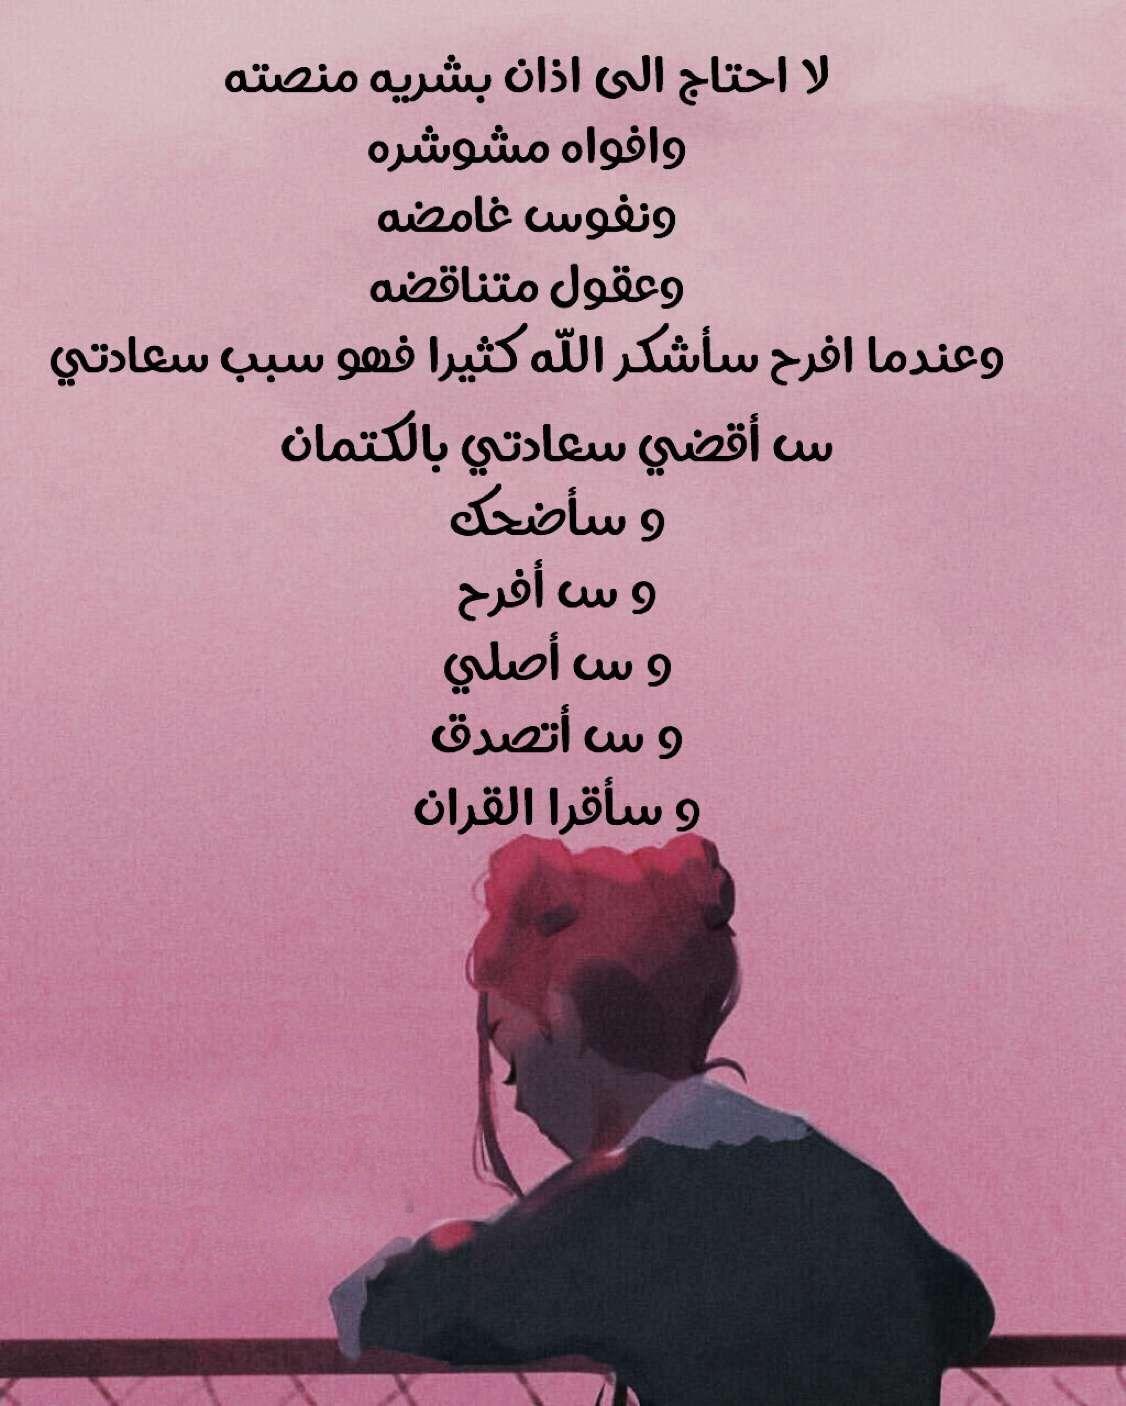 Arabic words Pin by sana diab on